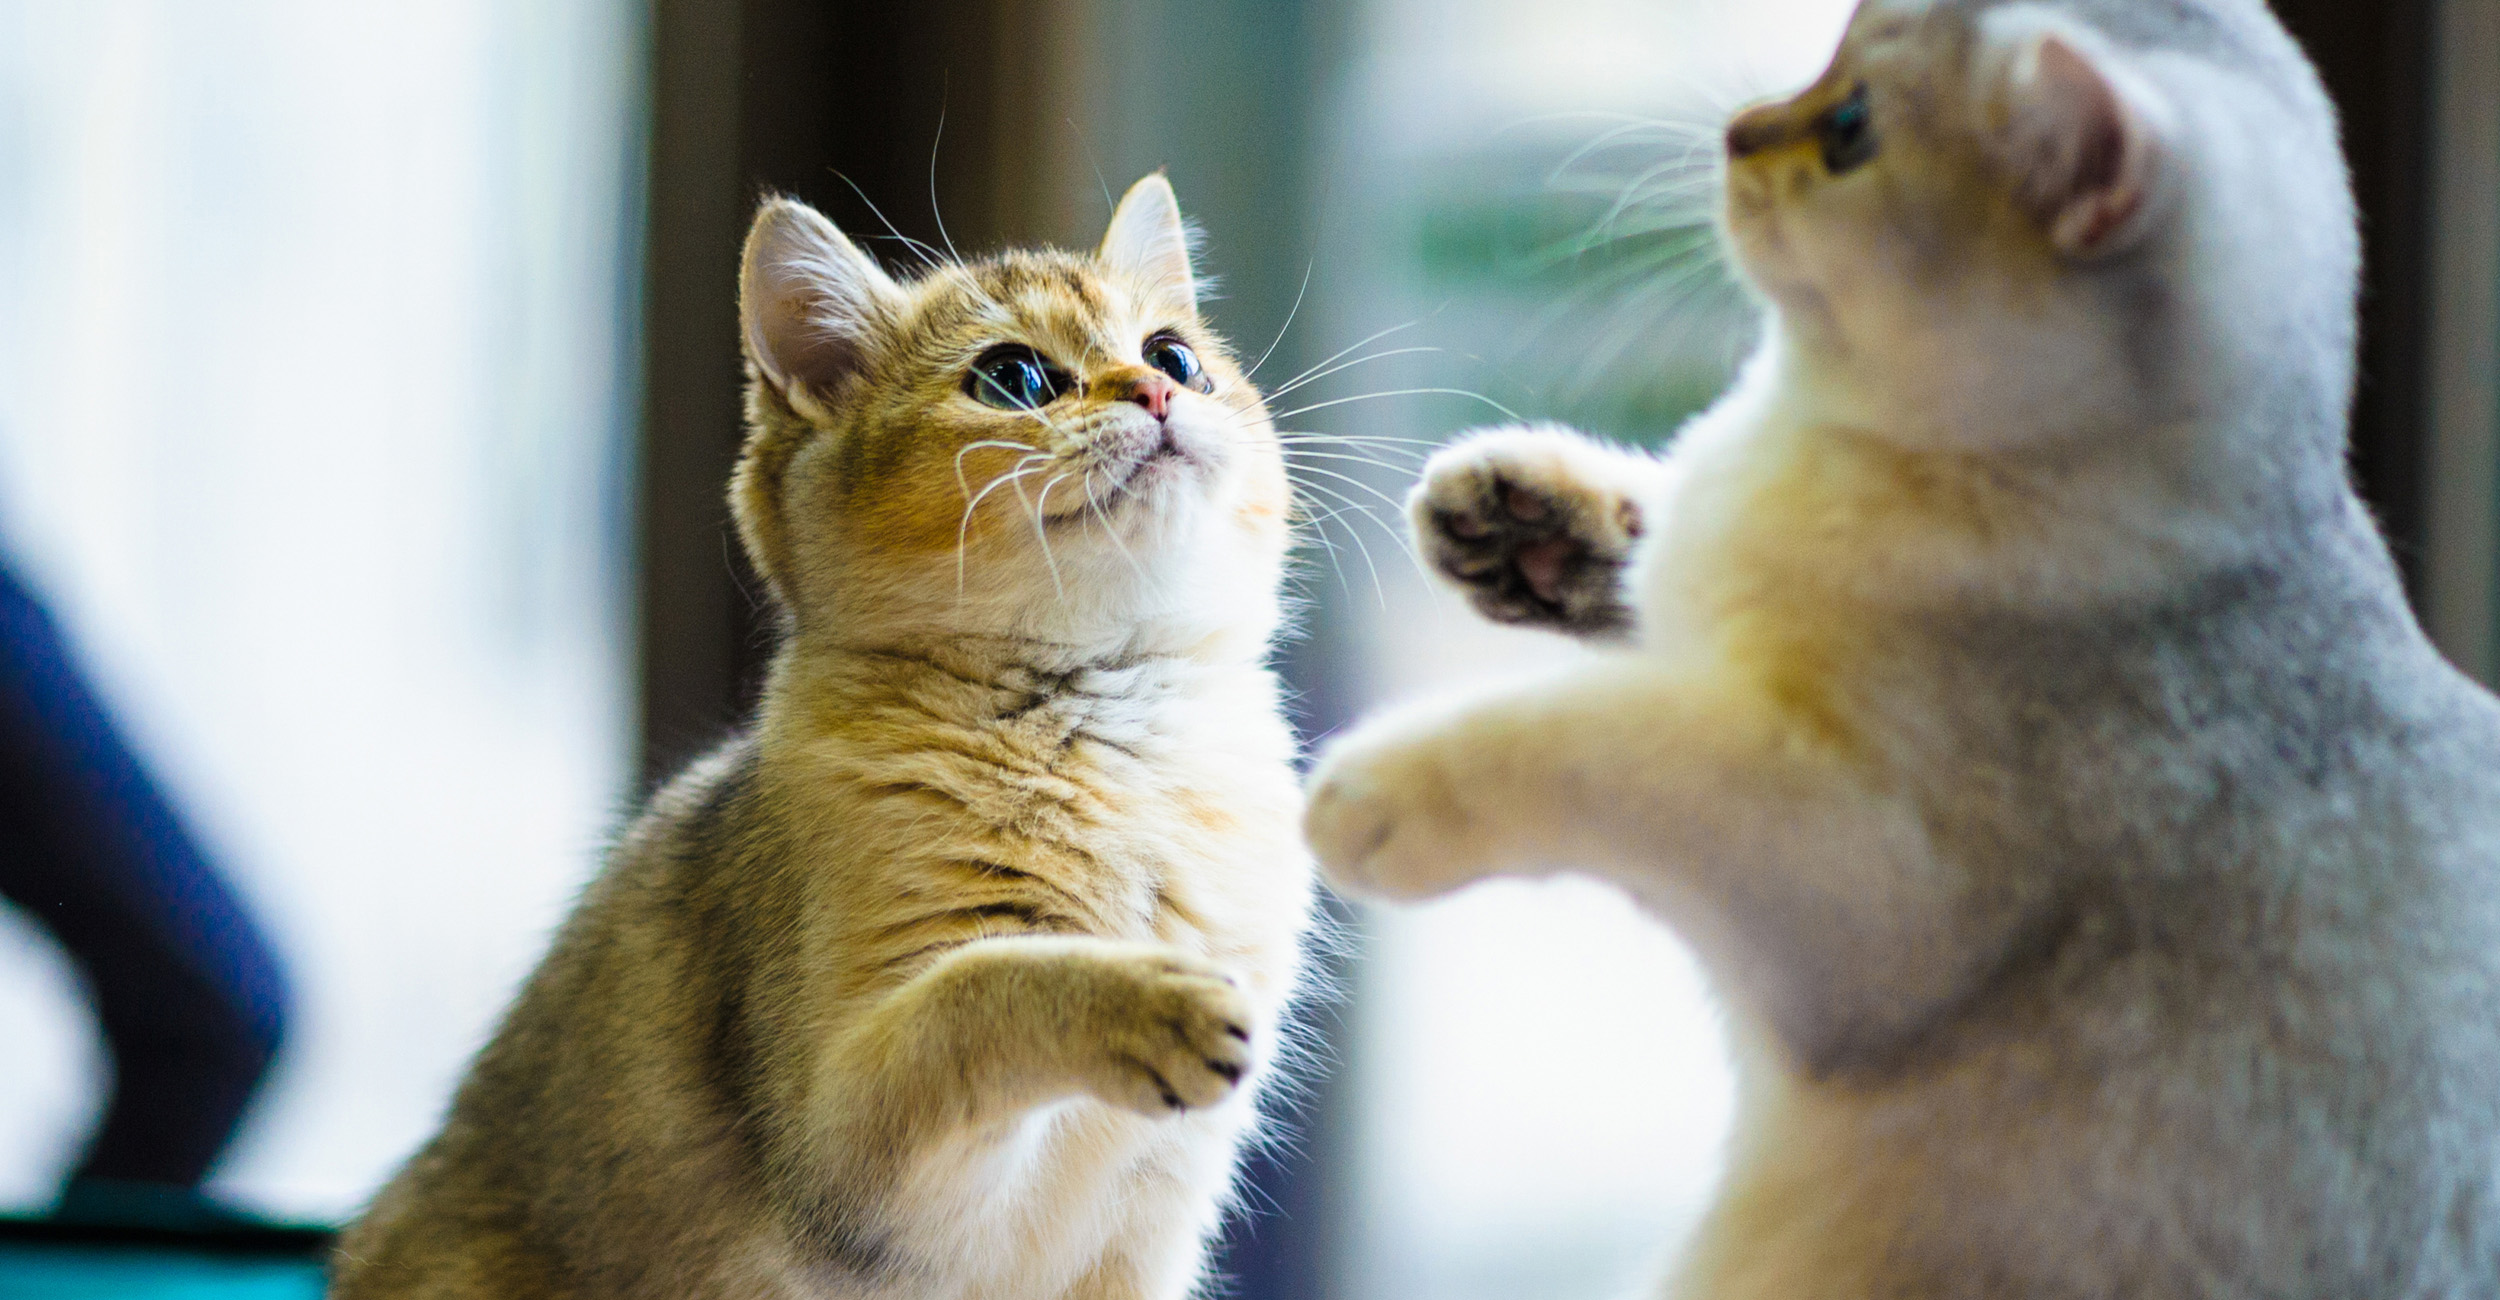 Homepageslider_kittens#1_2500x1300px